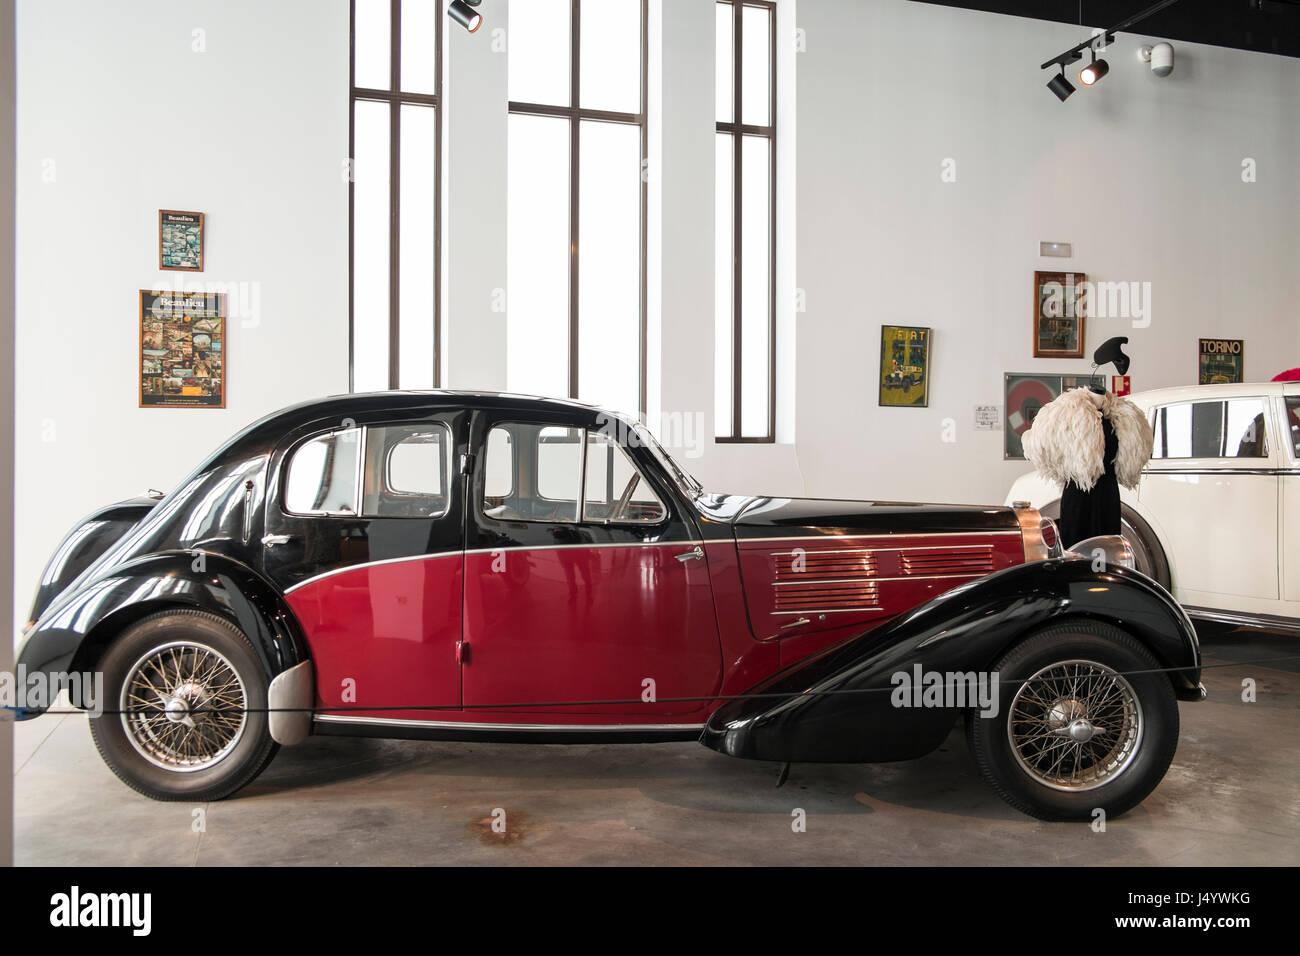 1936 Bugatti Type 57C Galibier. Automobile museum fo Málaga, andalusia, Spain. - Stock Image